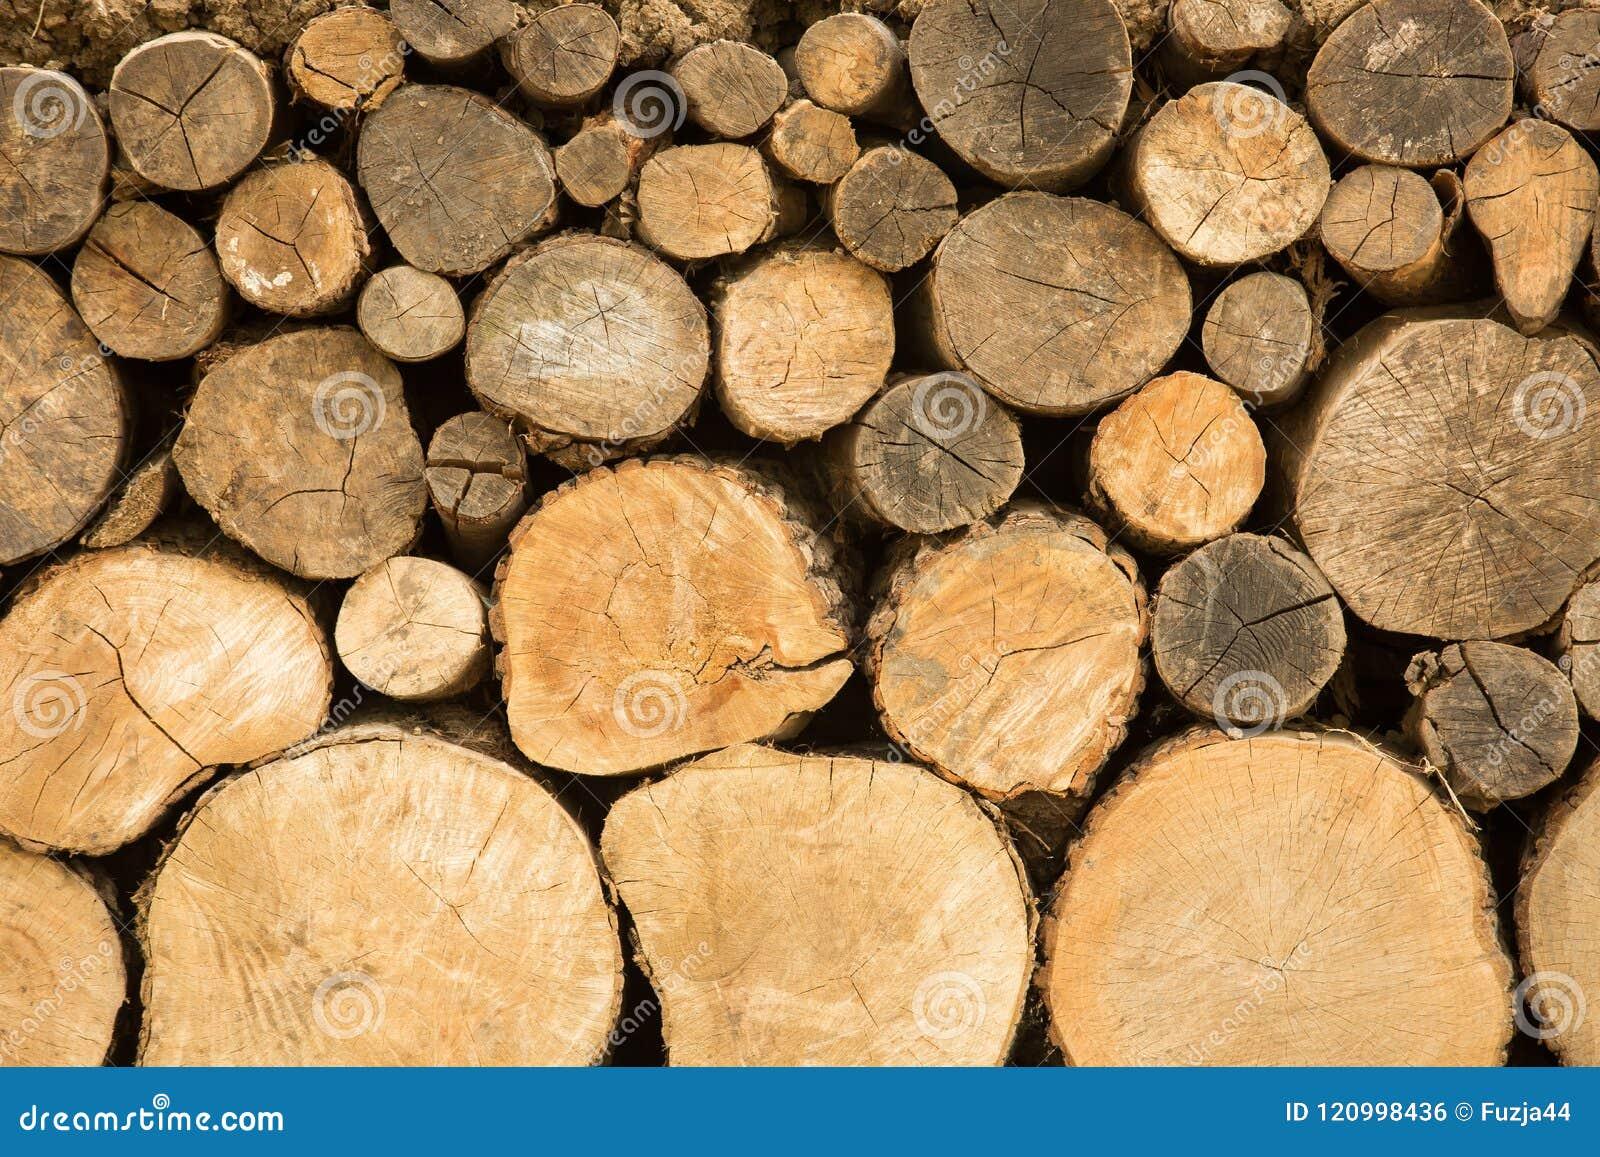 Wooden Tile Background Stock Photo Image Of Circle 120998436